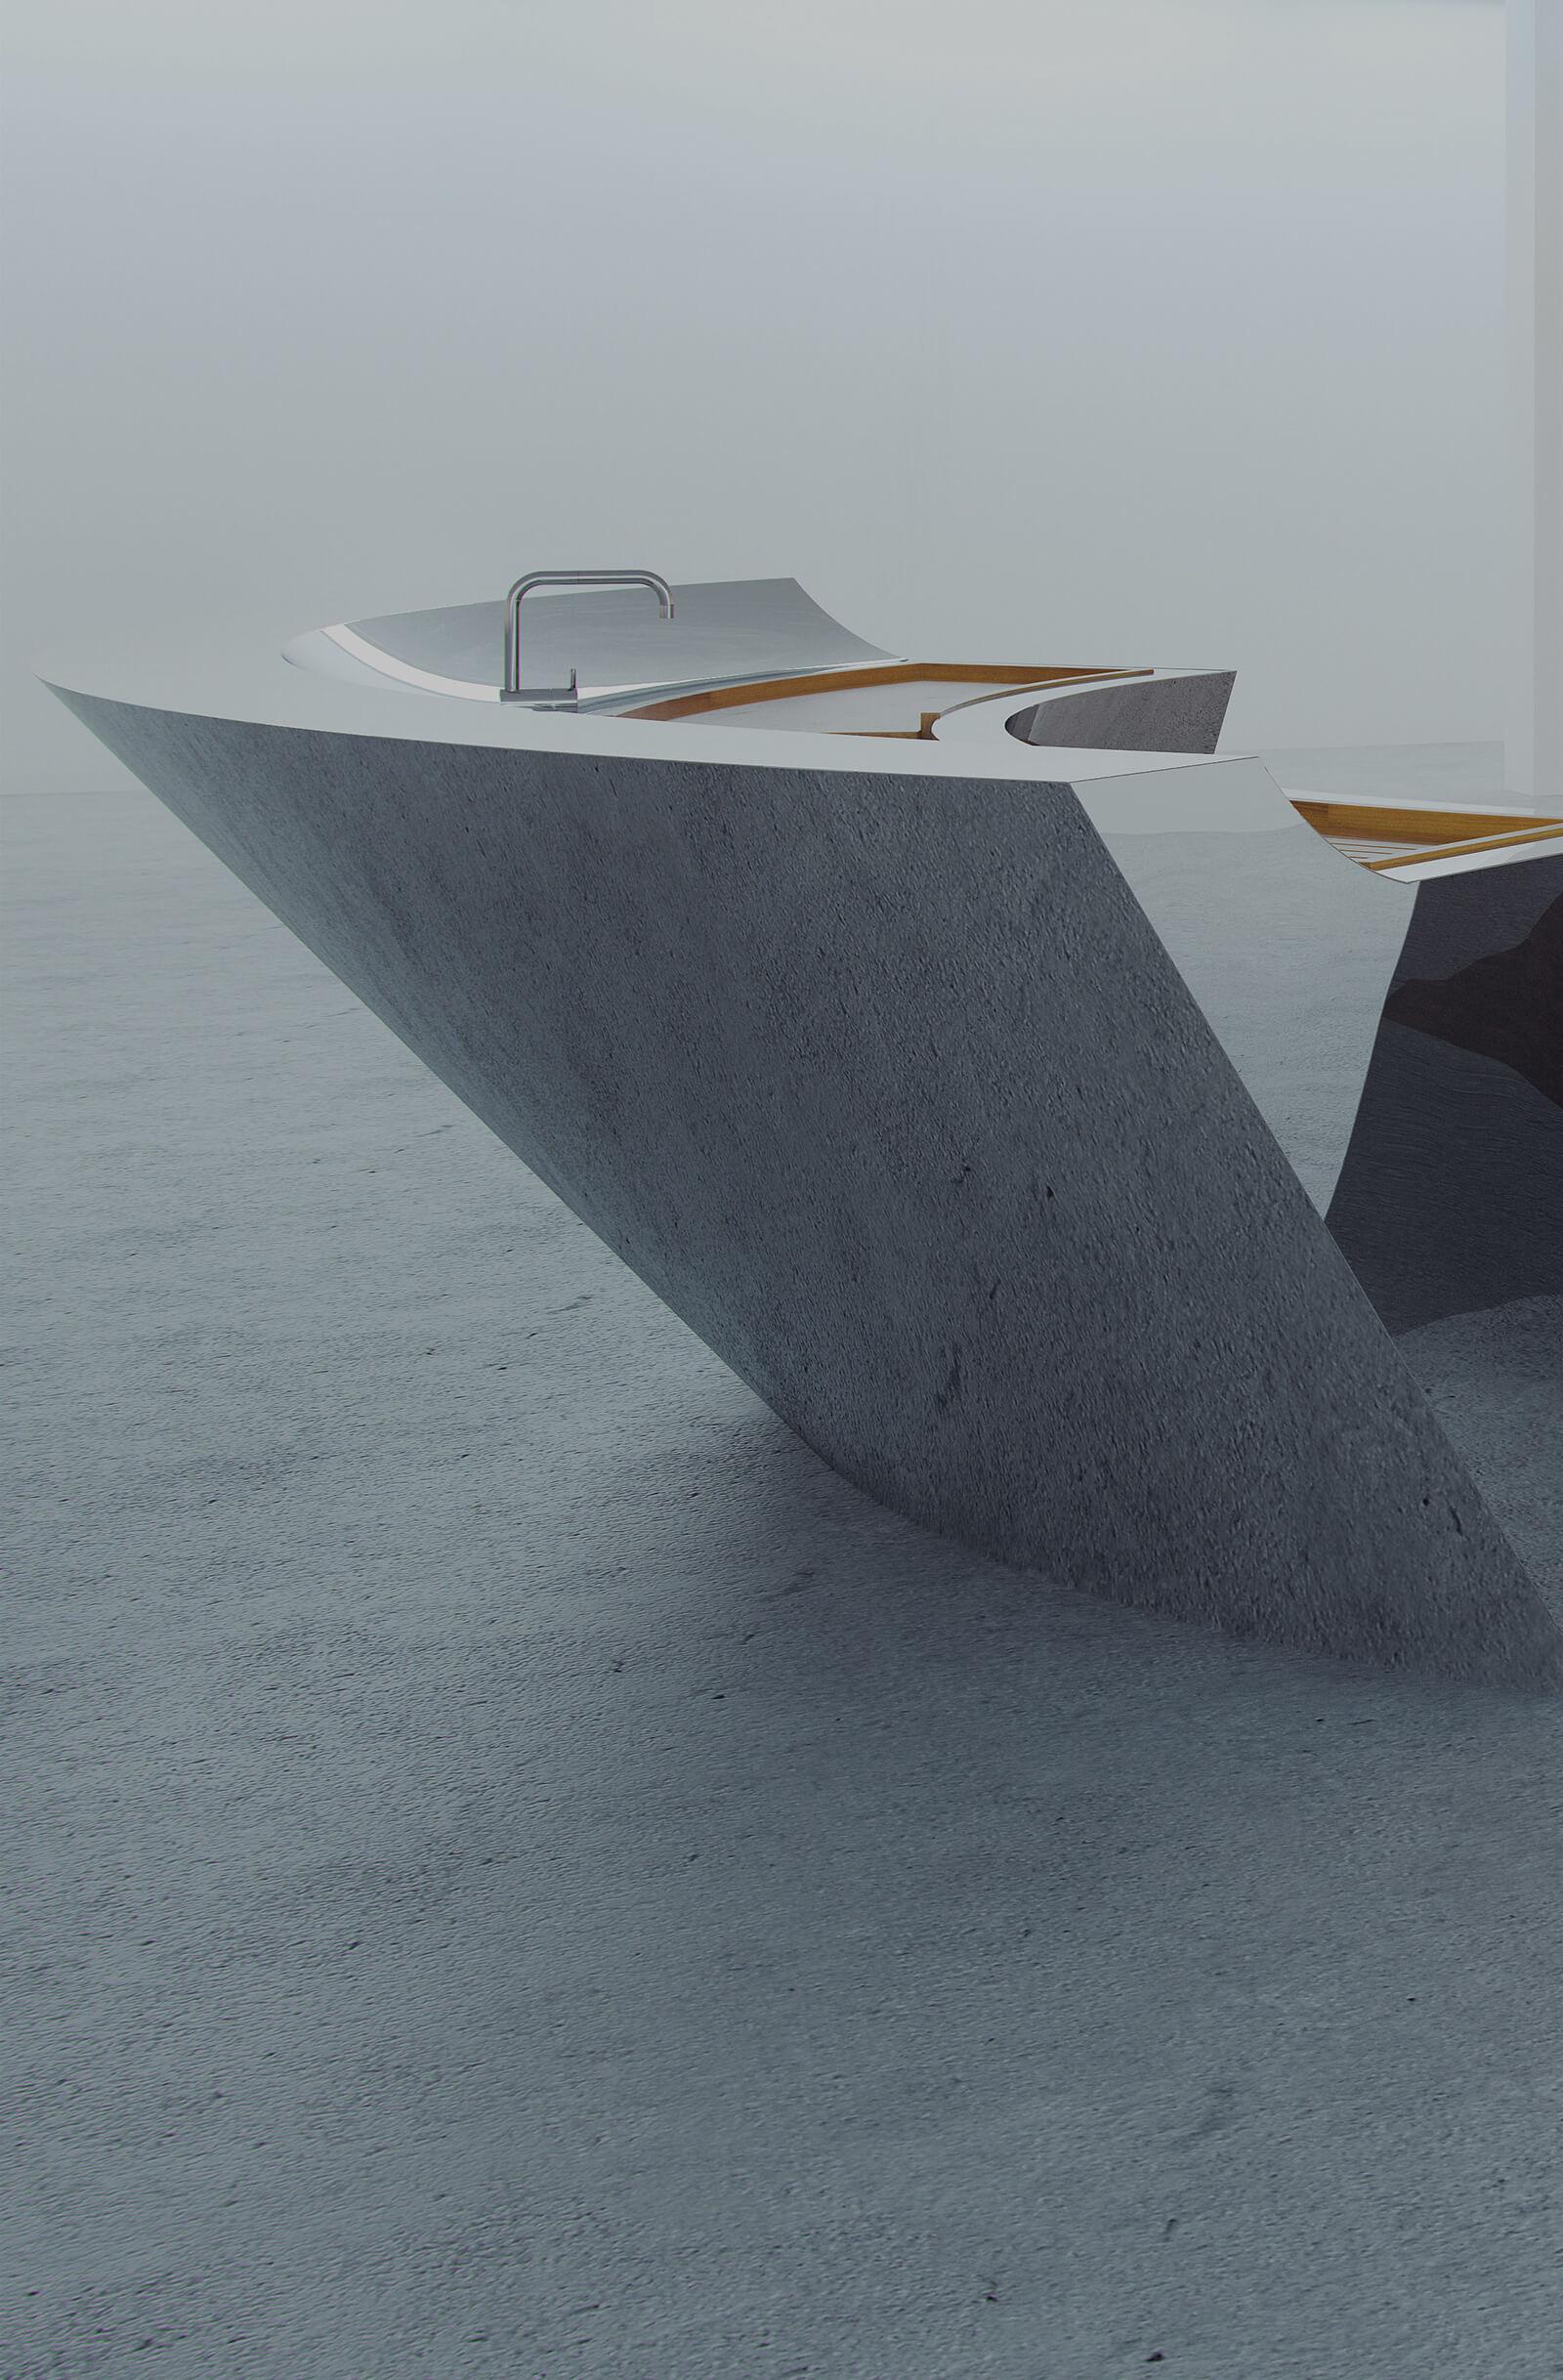 Radical kitchen design in polished steel by Splinterworks